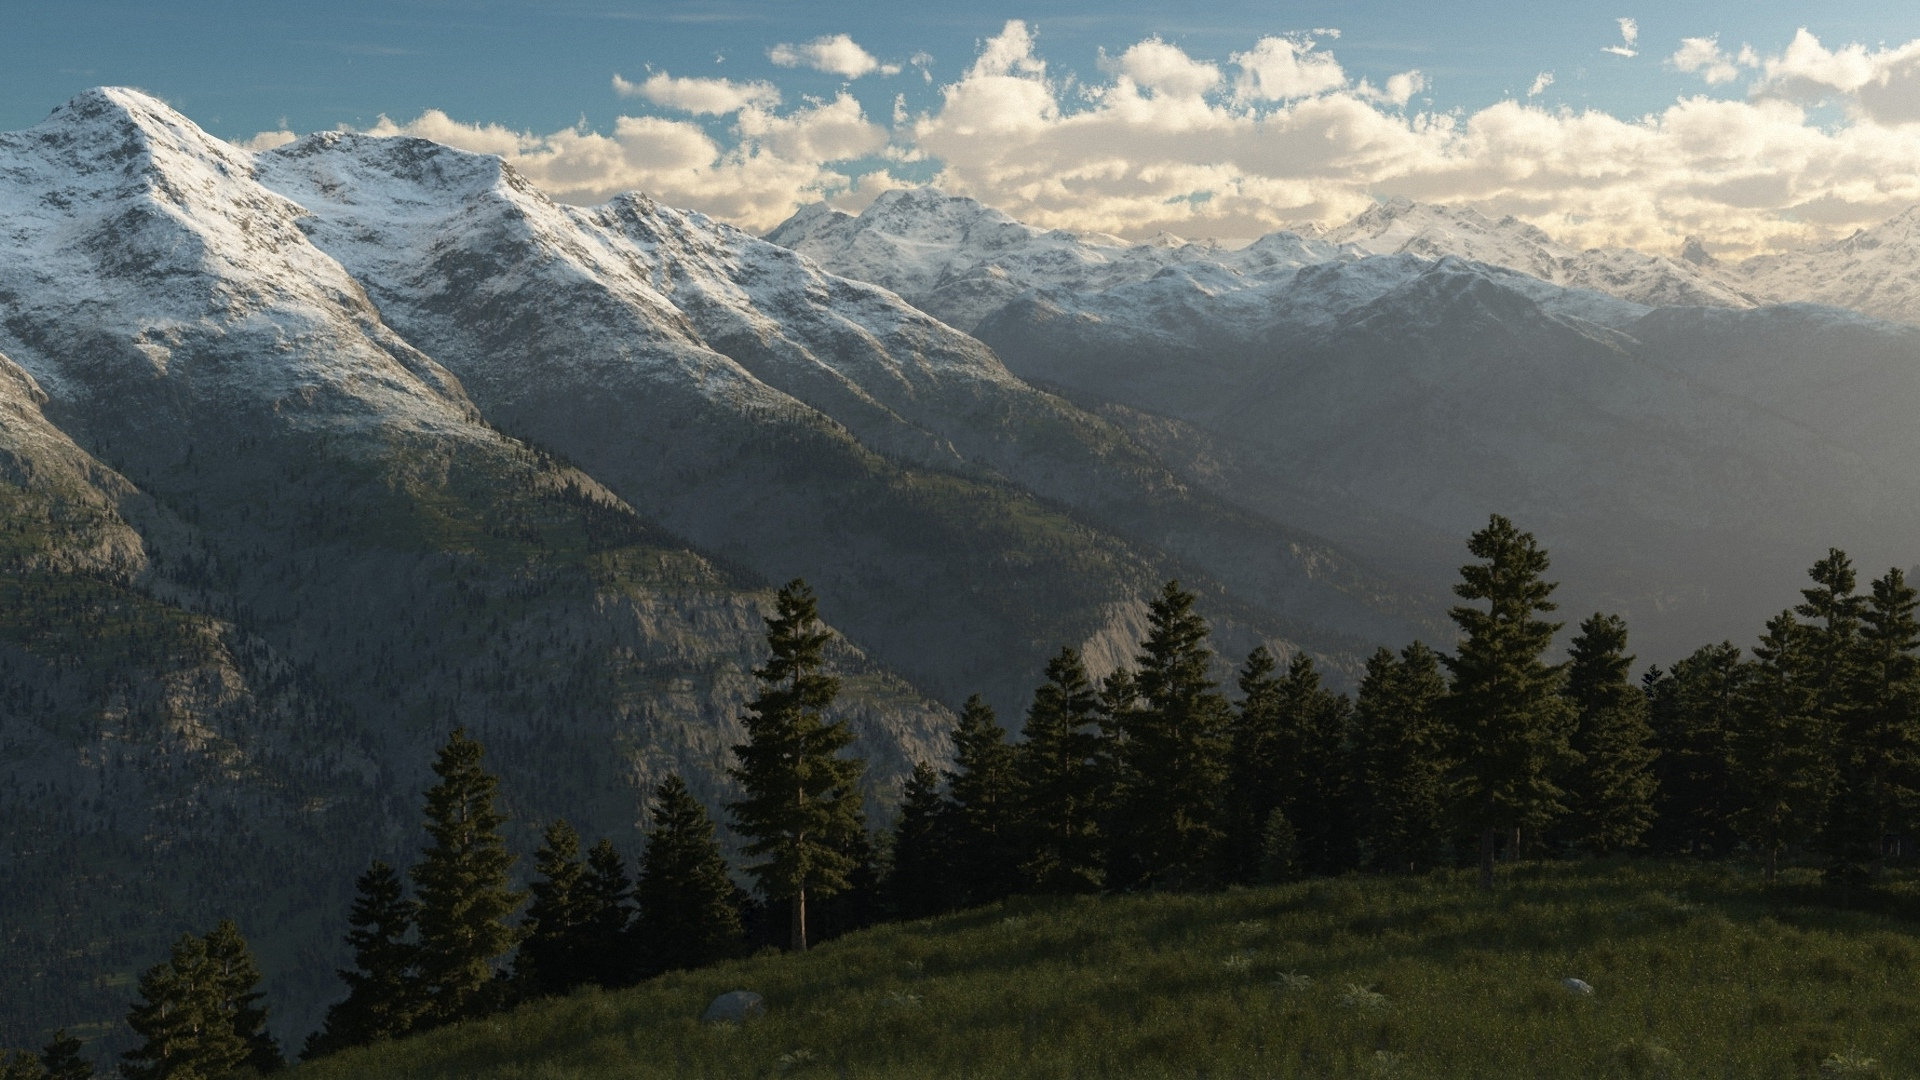 Wonderful Wallpaper Mountain Art - Trees-Landscape-Ridge-Hill-Art-Peaks-Wallpaper-1920x1080  Photograph_4866.jpg